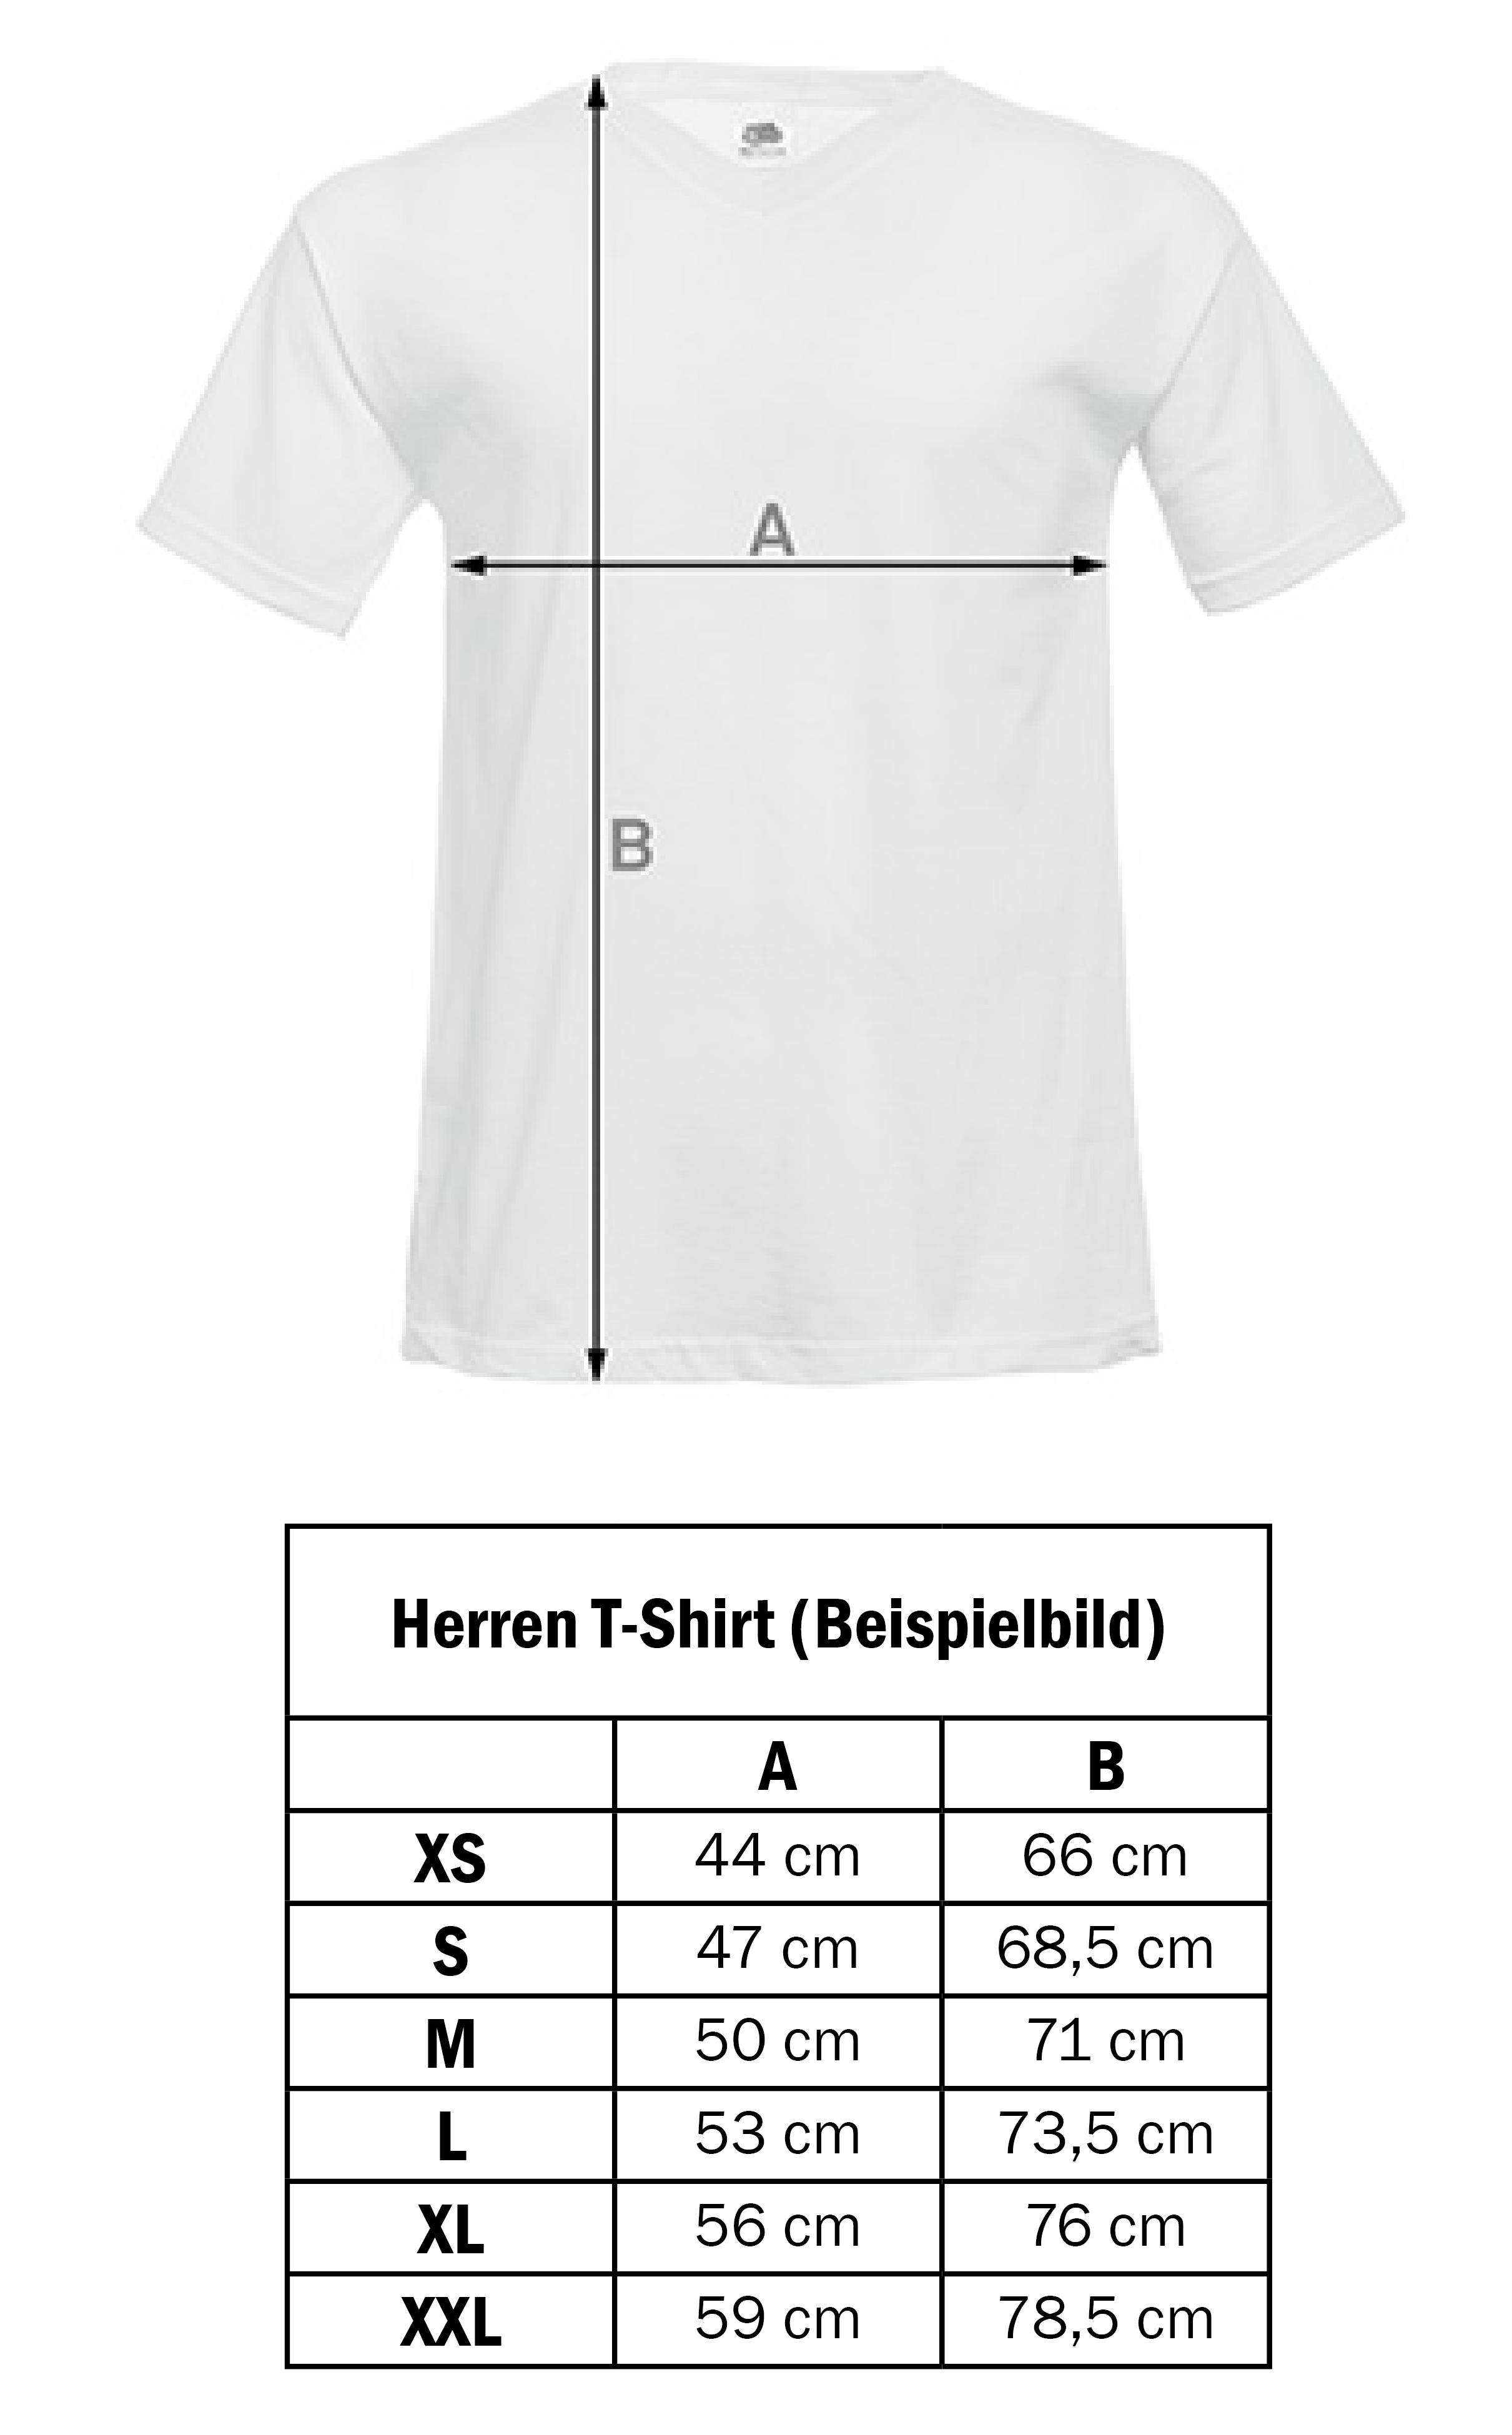 Gr-ssentabelle_Herren_Tshirt